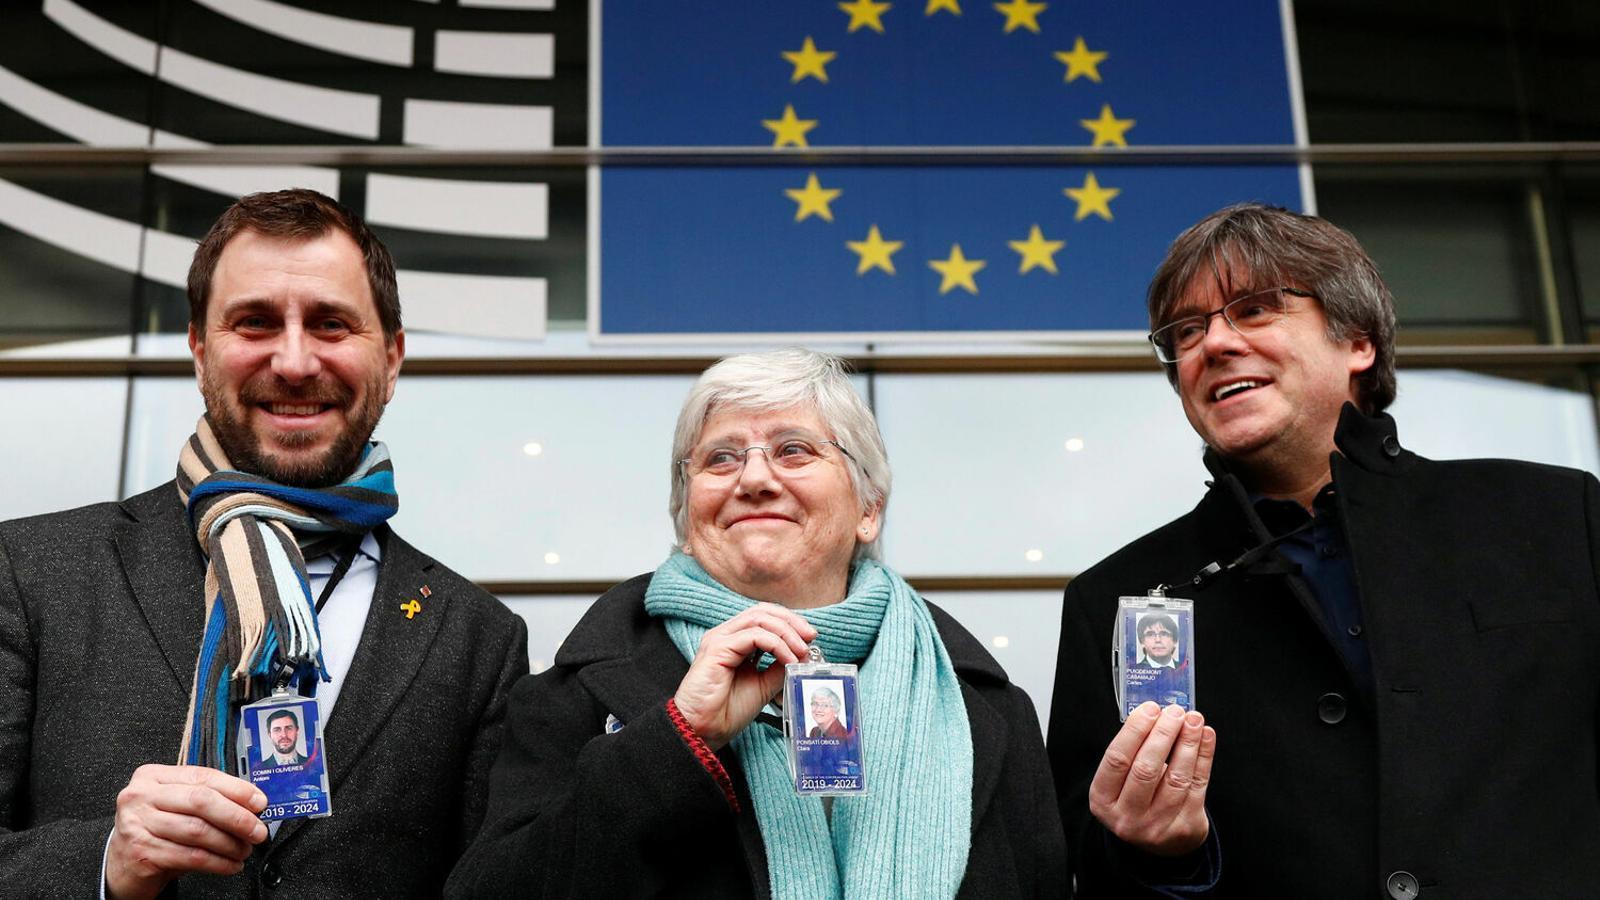 Puigdemont i Comín acompanyant Ponsatí a recollir l'acreditació